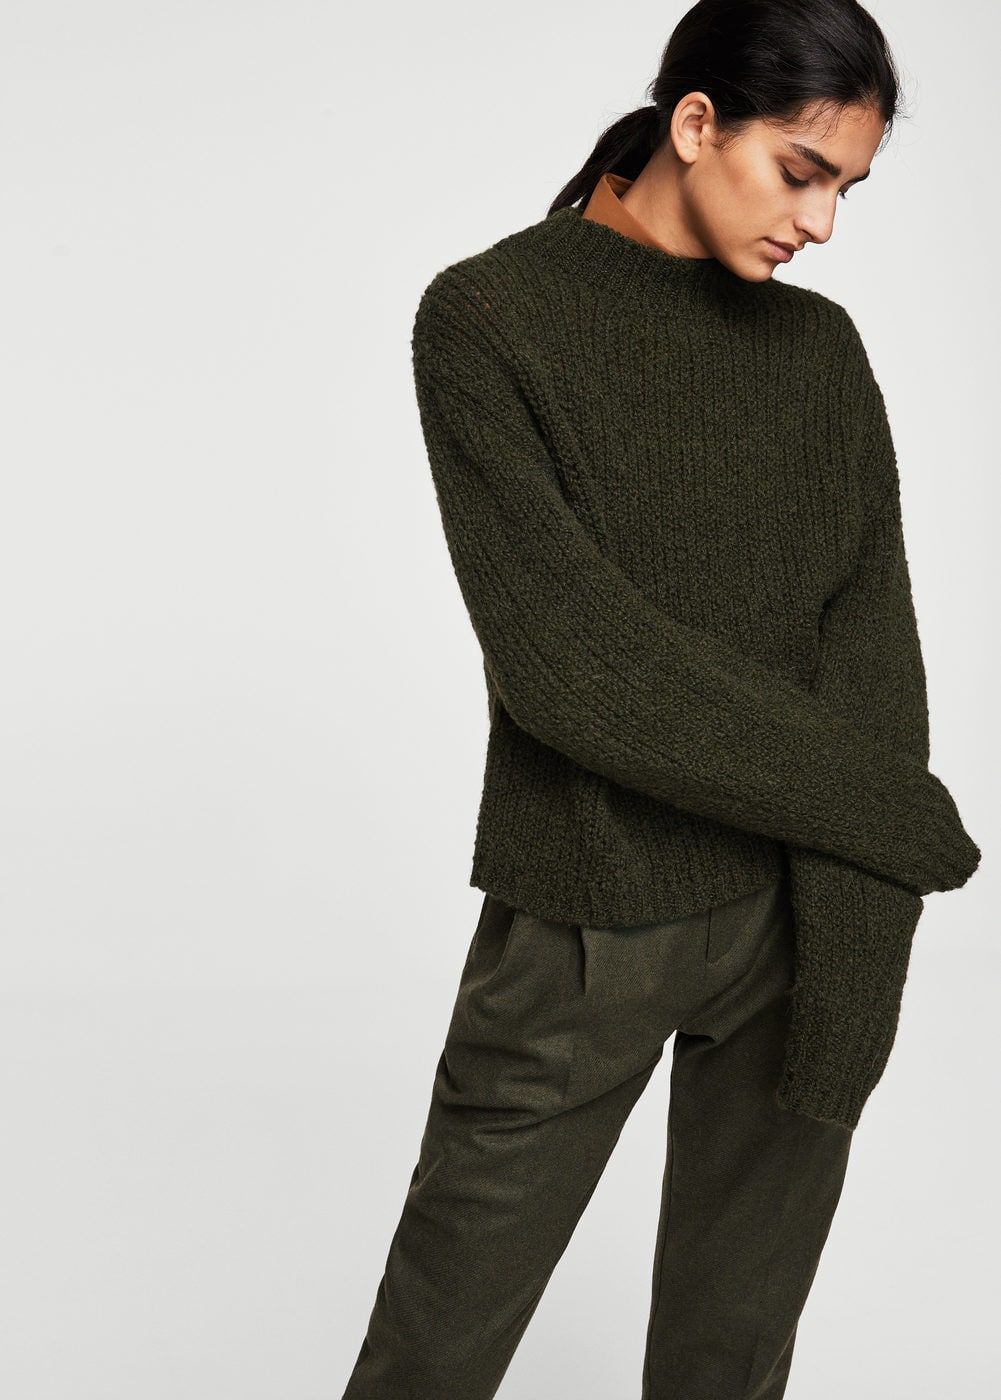 High collar wool sweater - Woman | MANGO United Kingdom